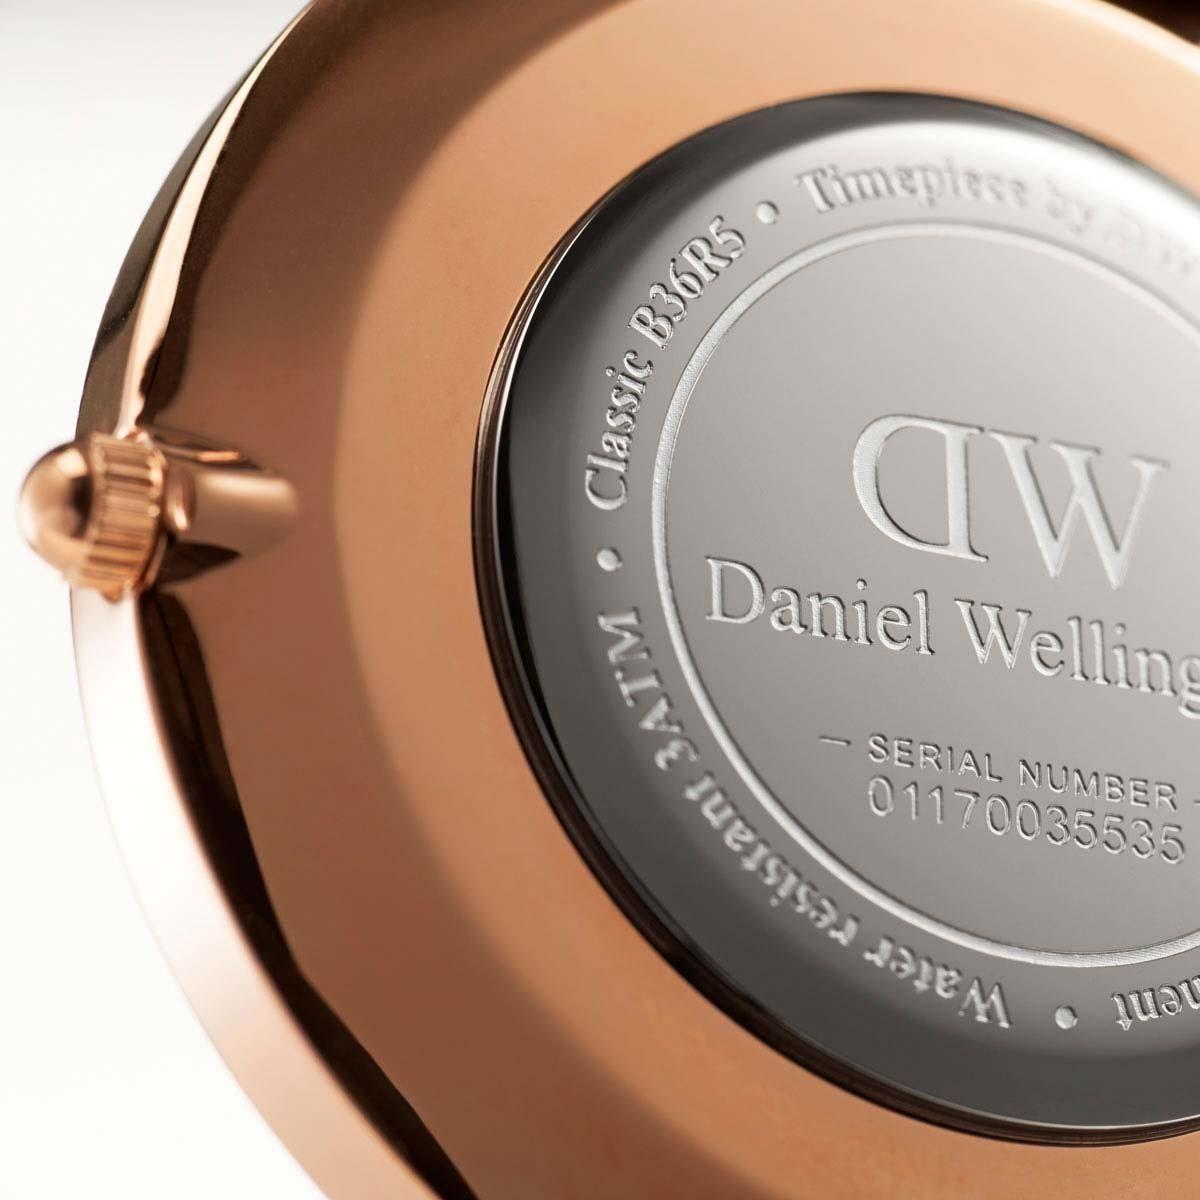 dw官网 dw手表官网 dw中国官网 dw官方旗舰店 DW DW官网  Bundle W+S Classic Sheffield RG 40mm+Cornwall 20mm